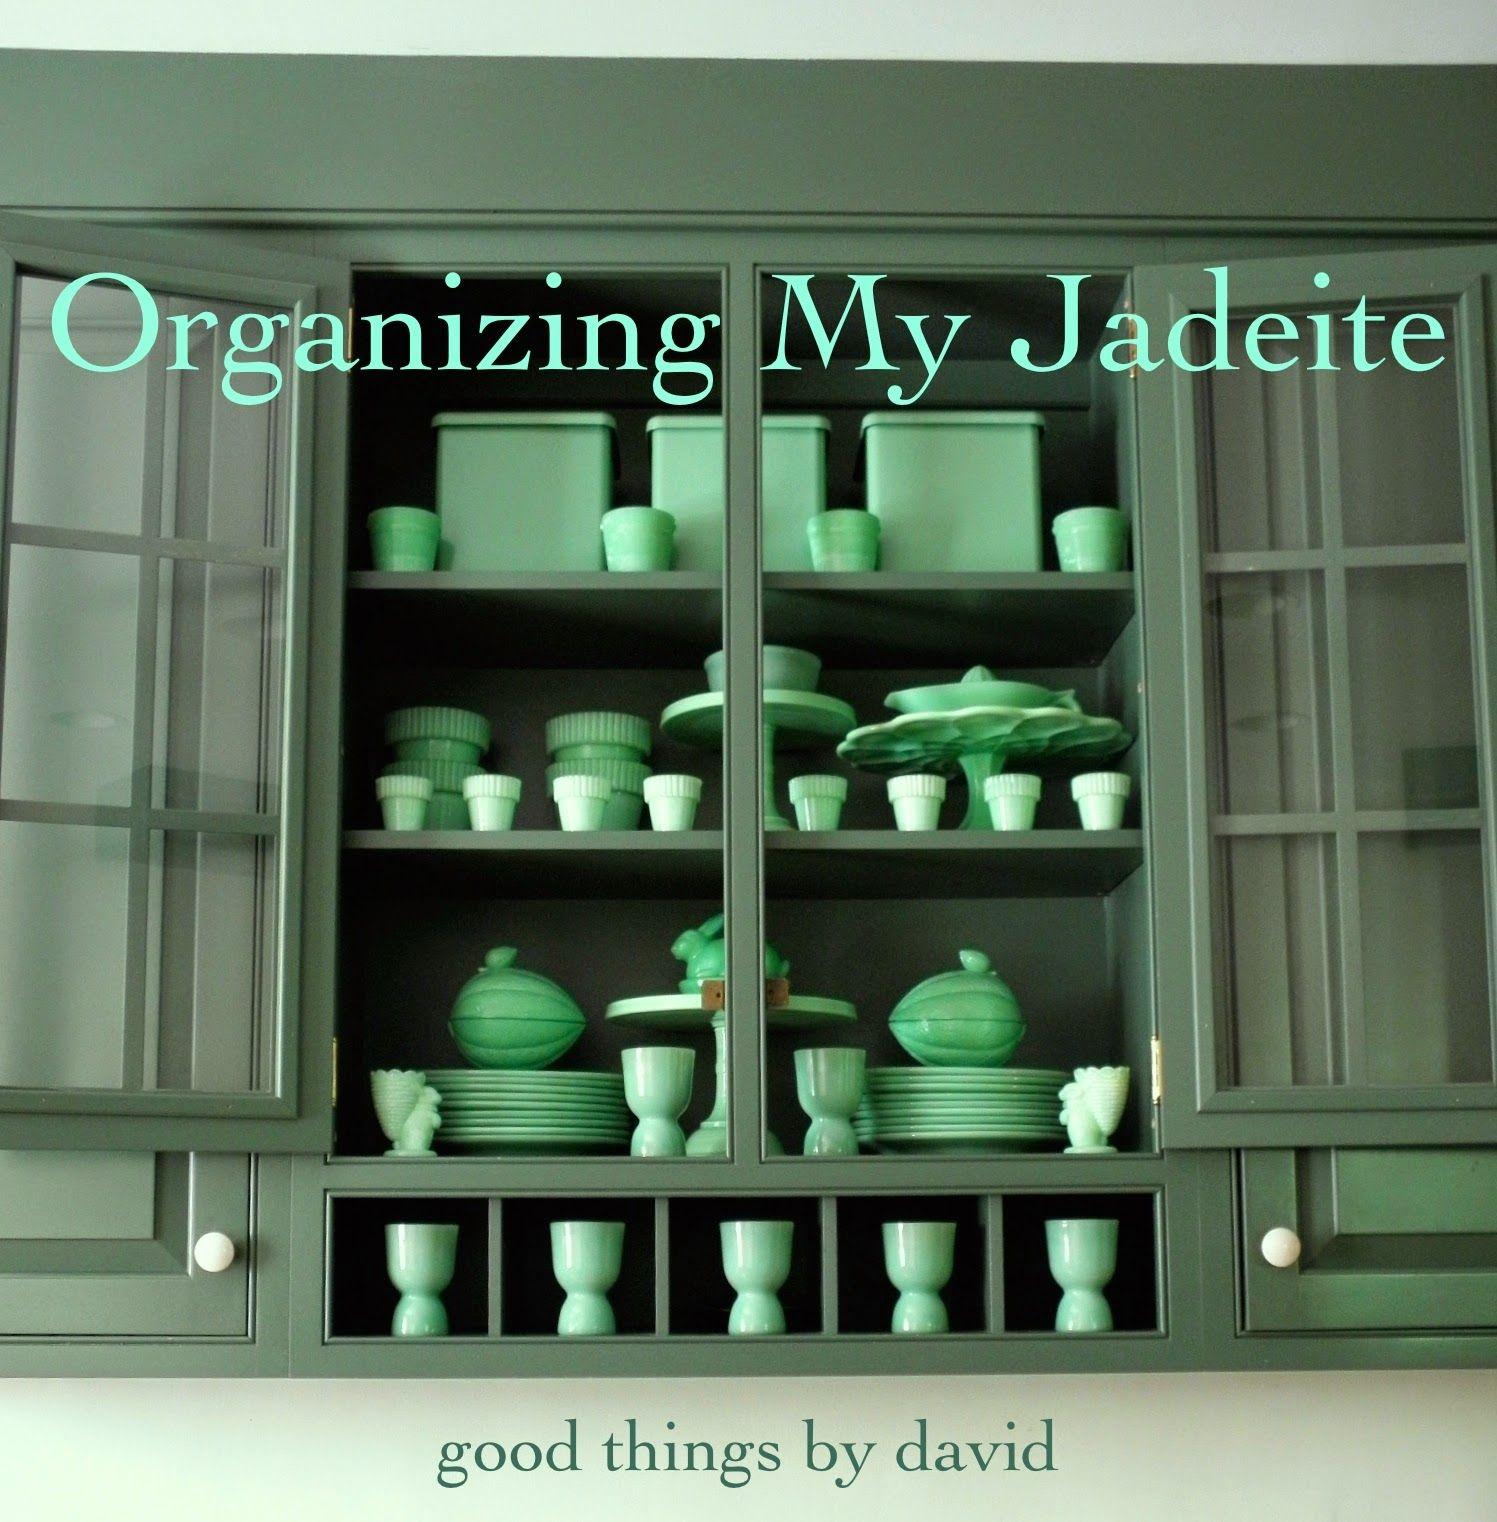 Good Things By David Organizing My Jadeite Jadeite Kitchens Green Milk Glass Vintage Glassware Vintage Dishes